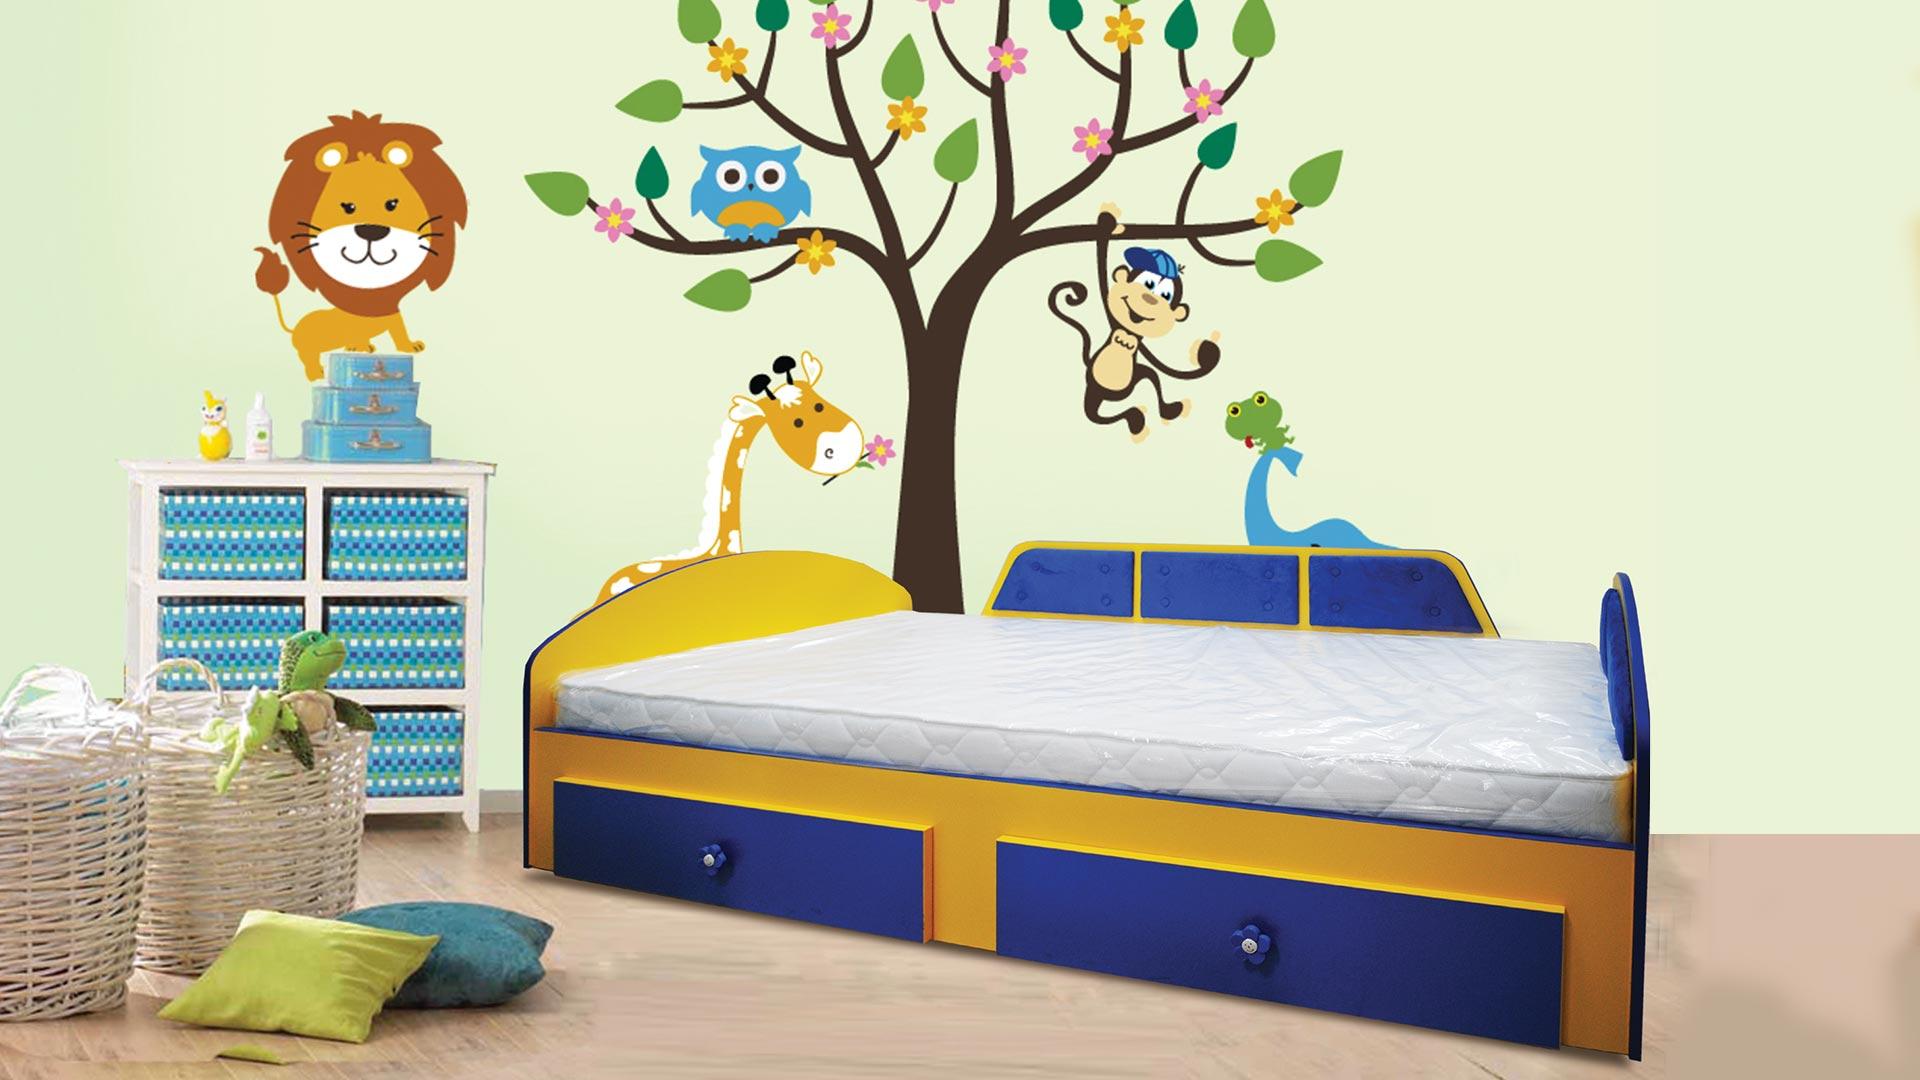 deciji-krevet-nodi